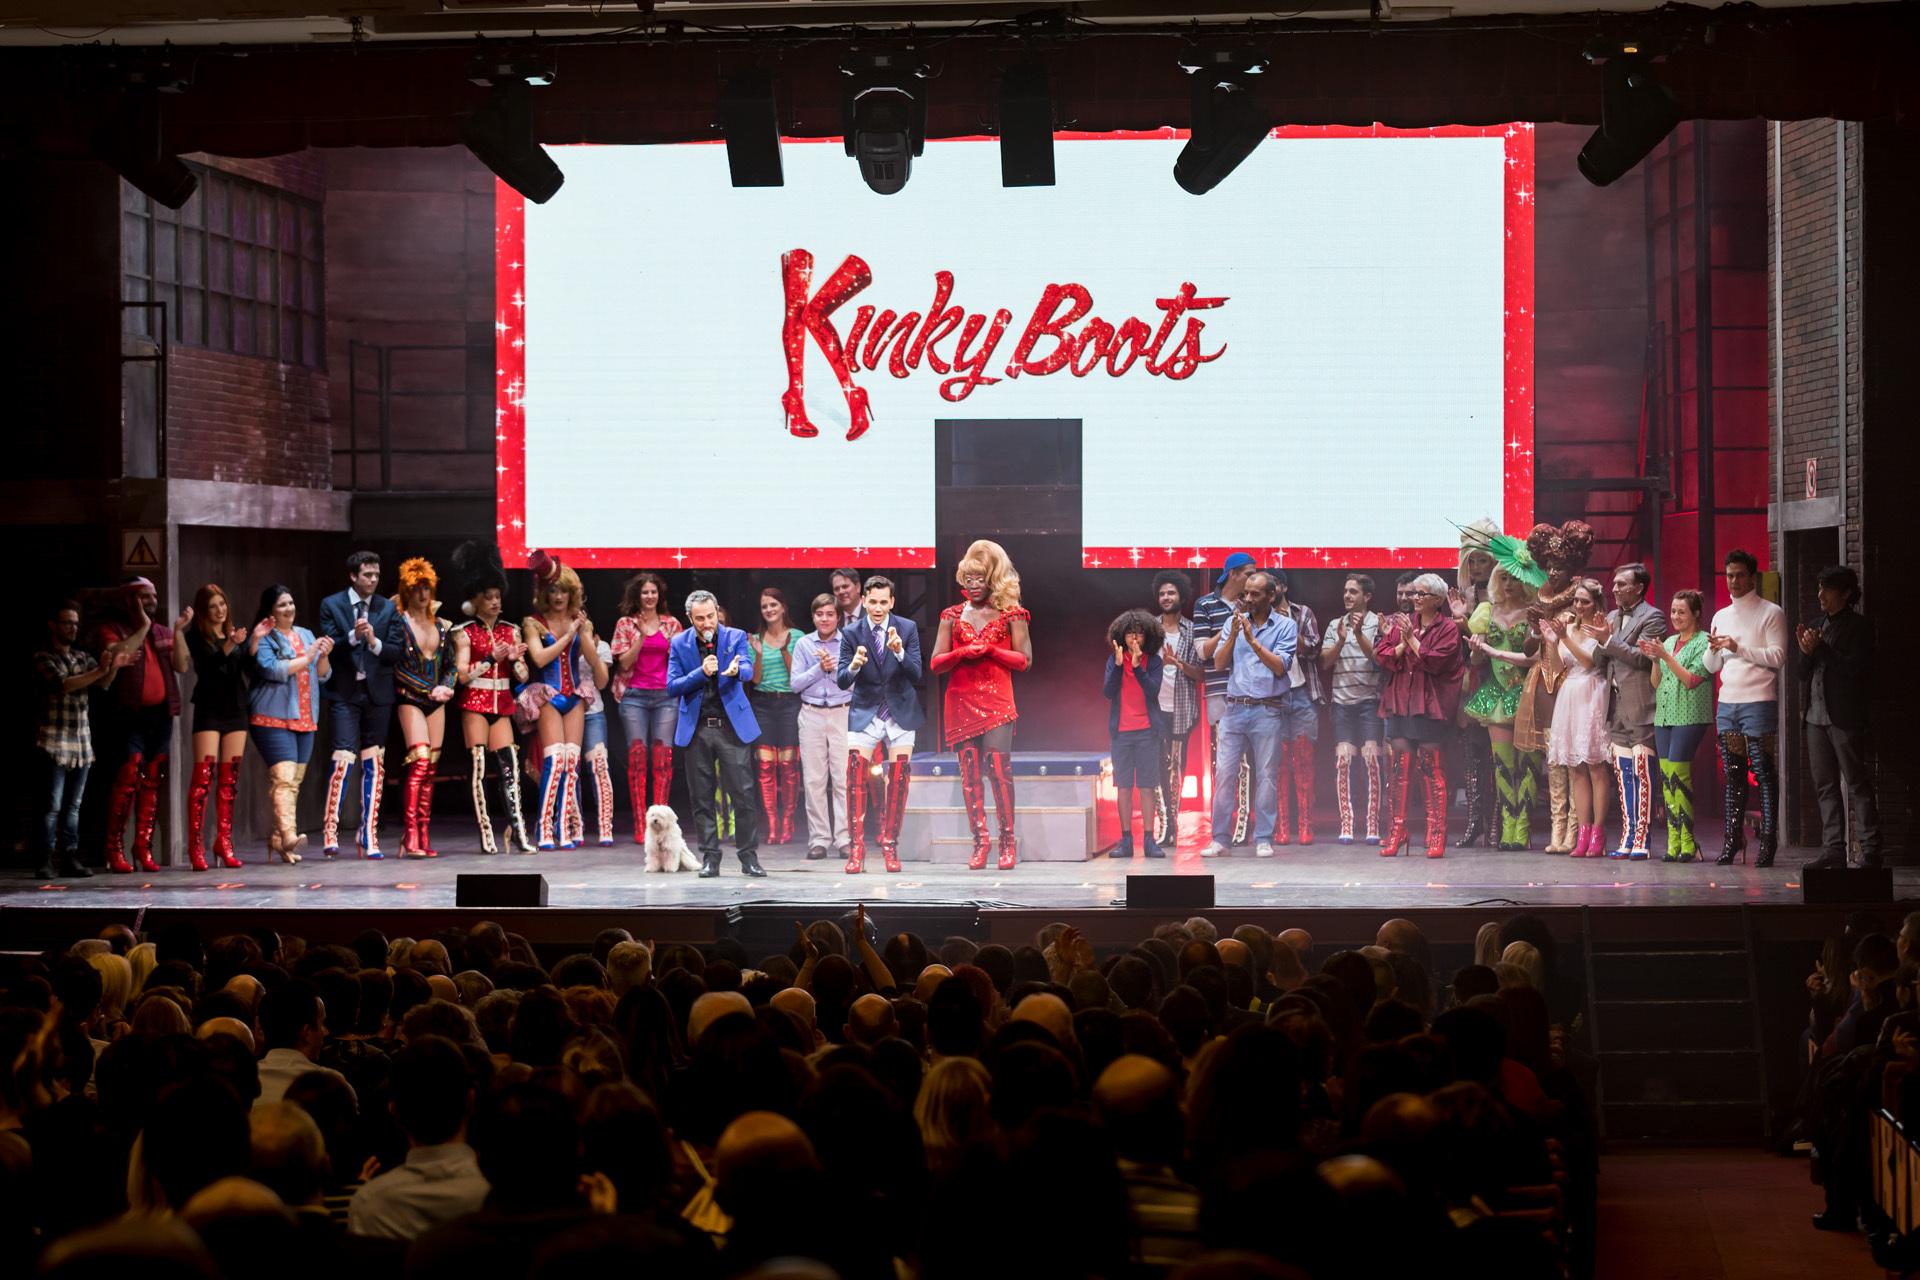 2018_11_30-©-LKV-Kinky-Boots-234024-5D4A5903